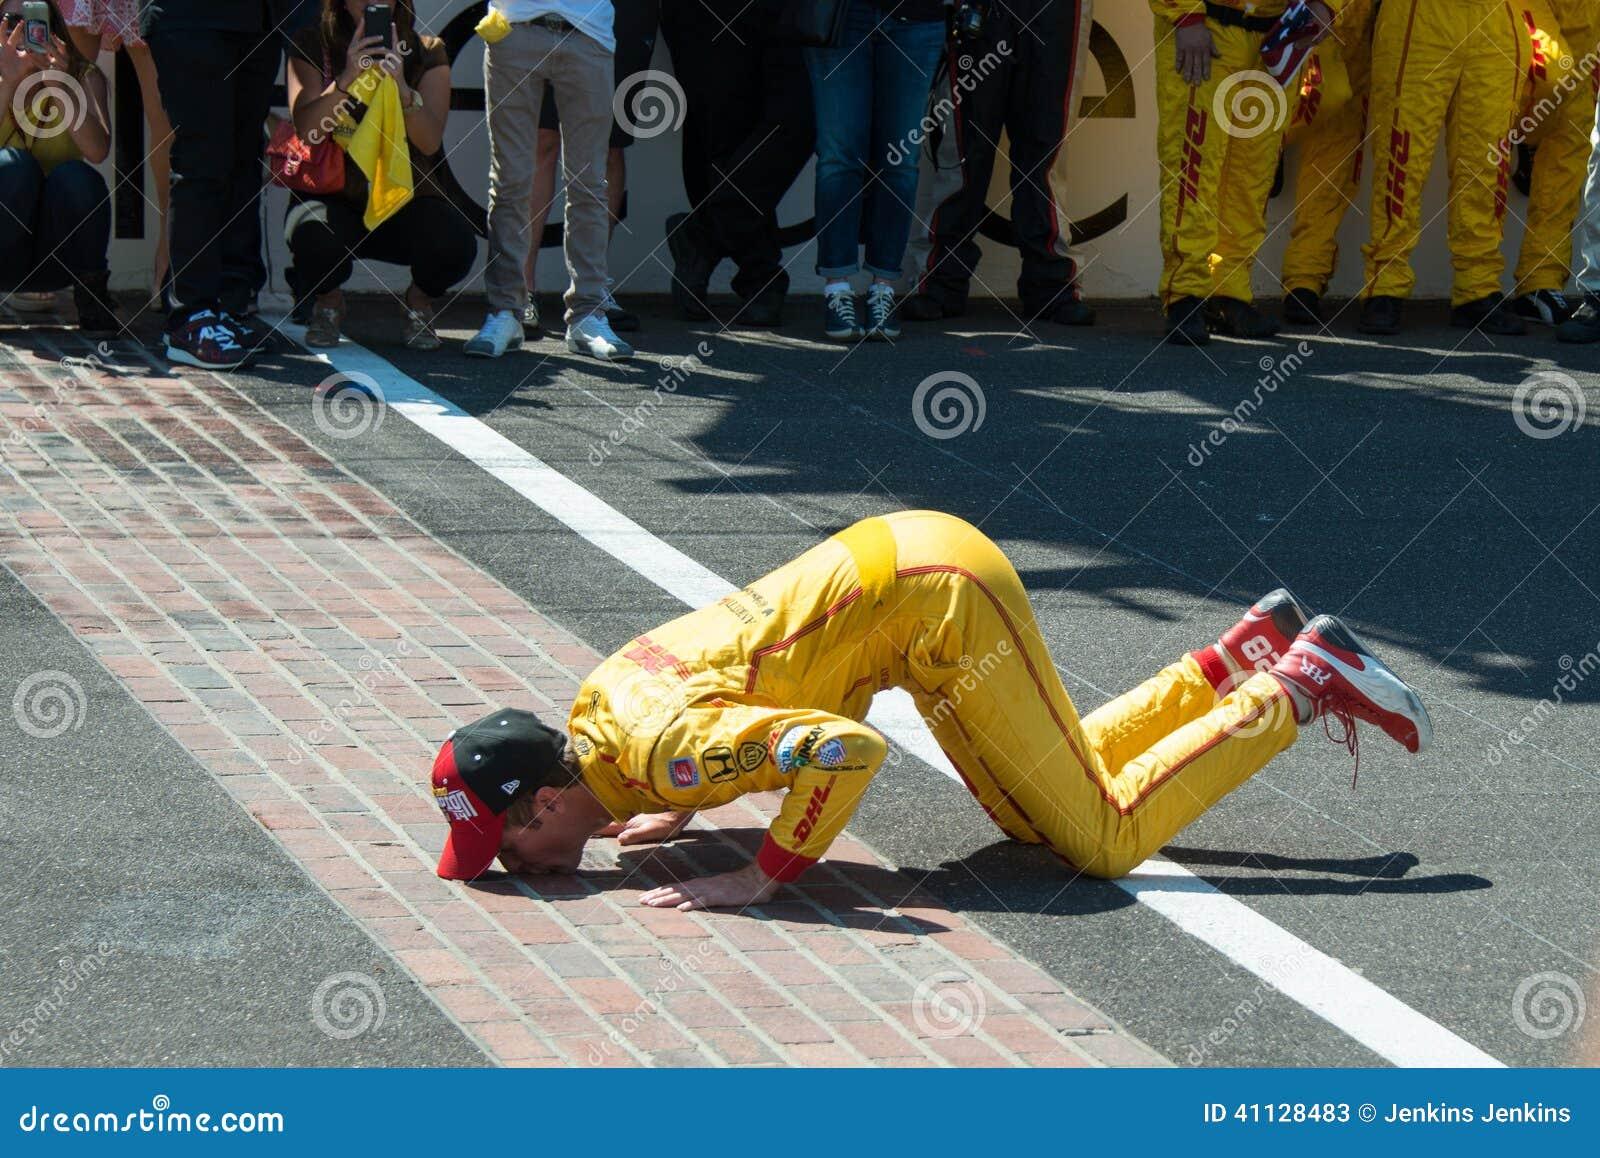 Indianapolis 500 2014